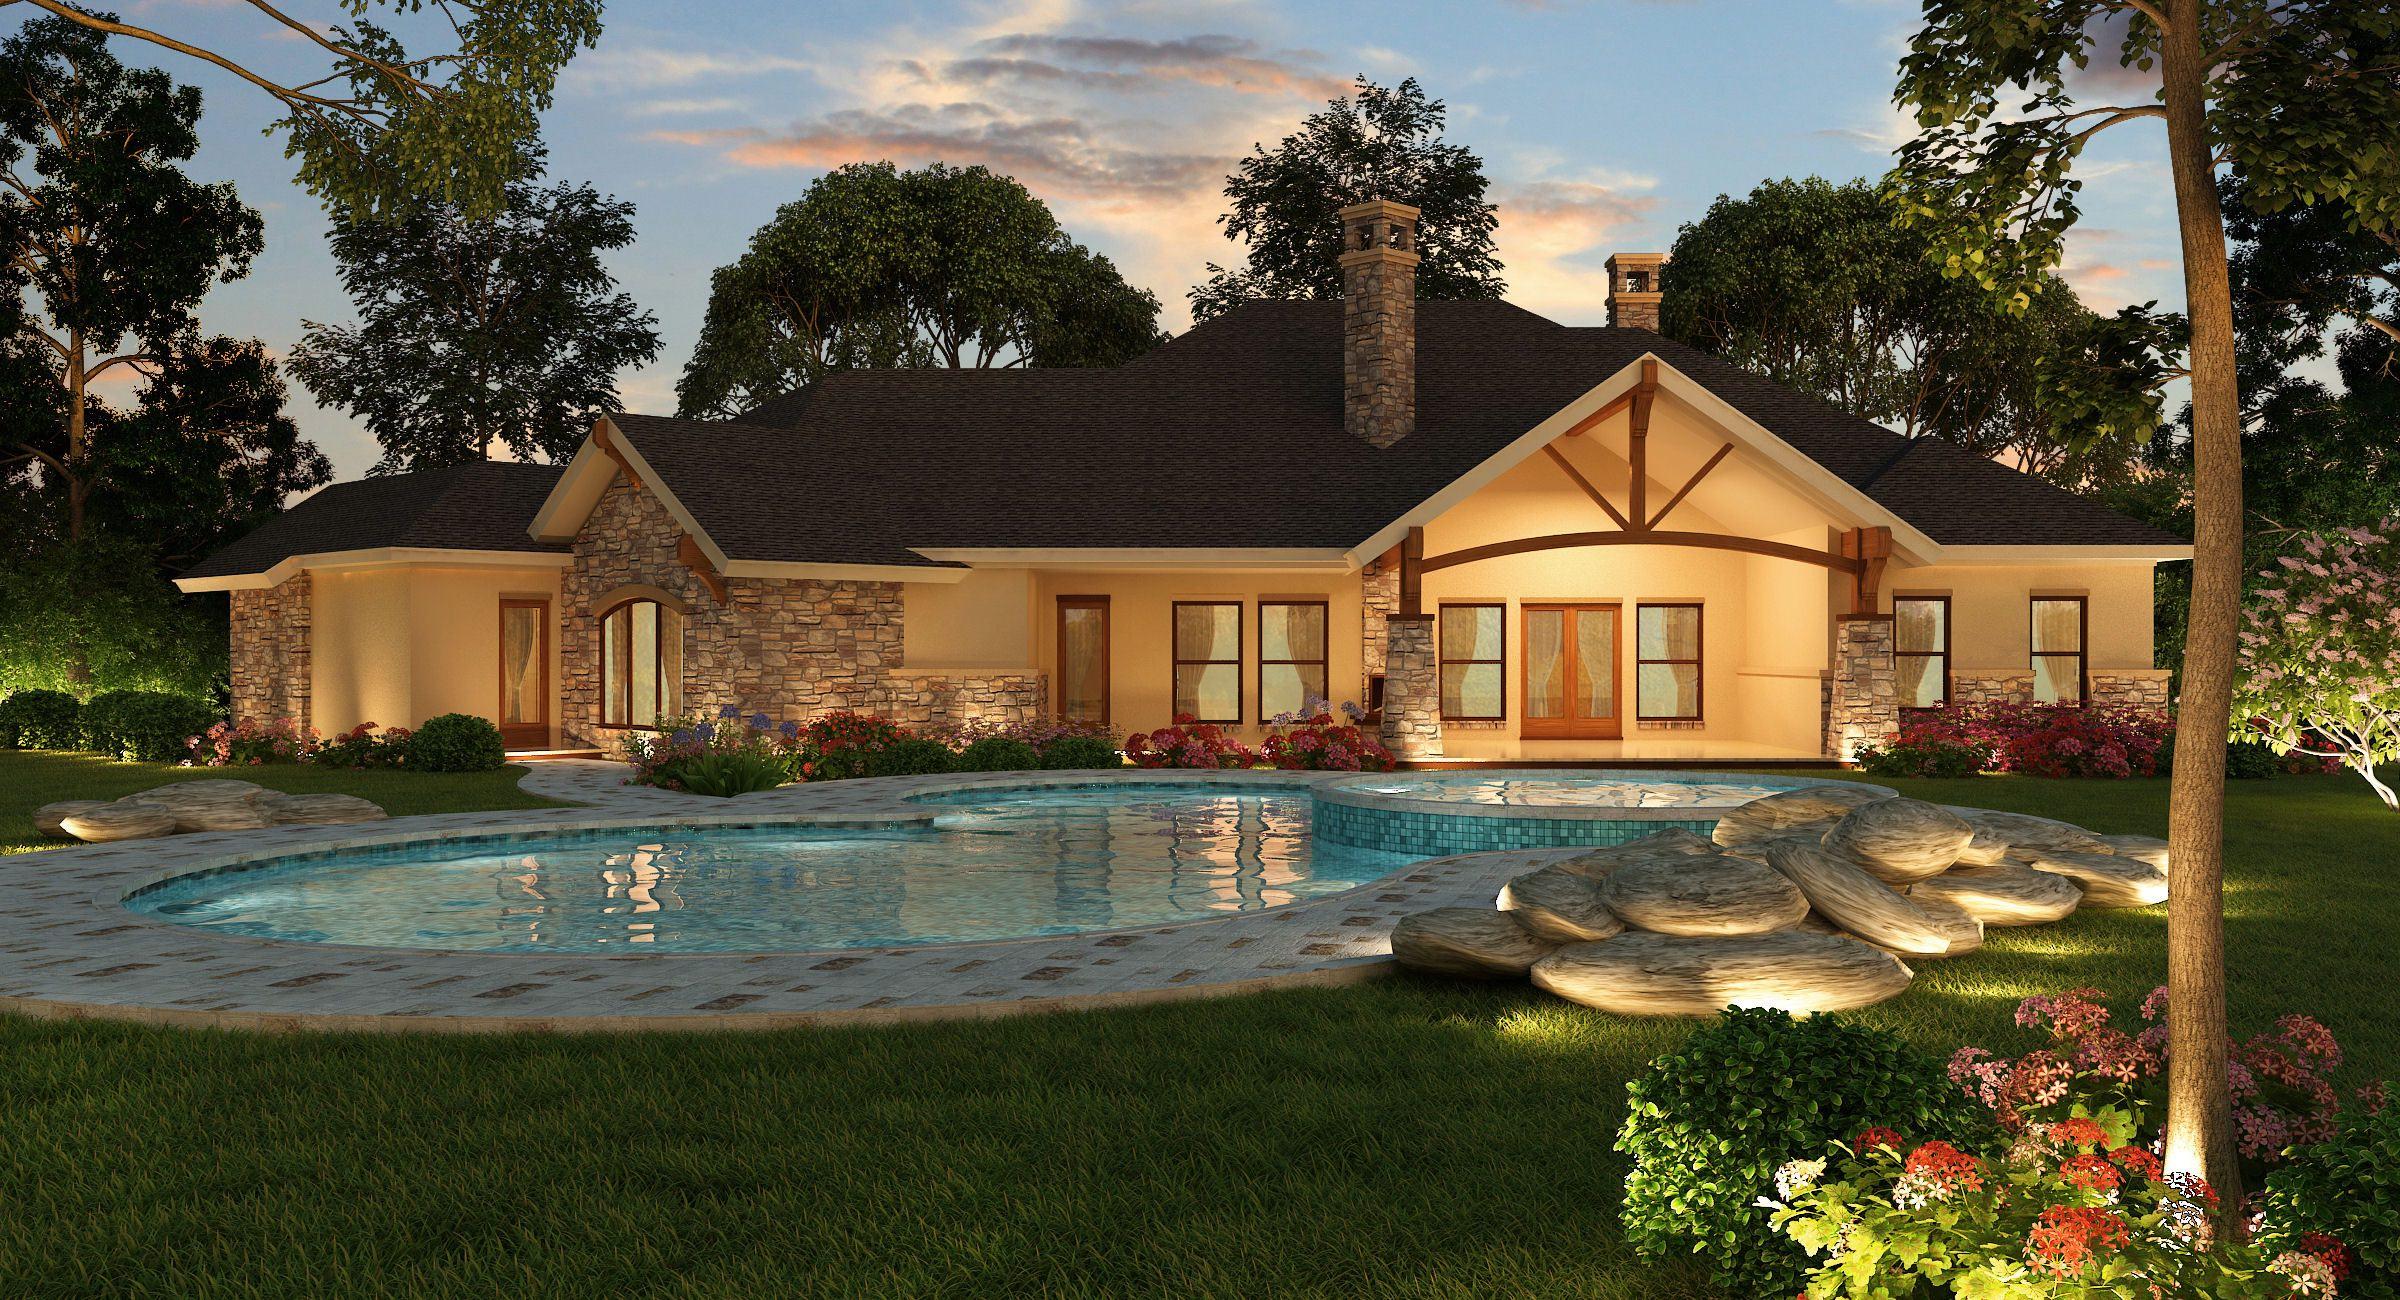 4 Bedrm 3584 Sq Ft Ranch House Plan 195 1000